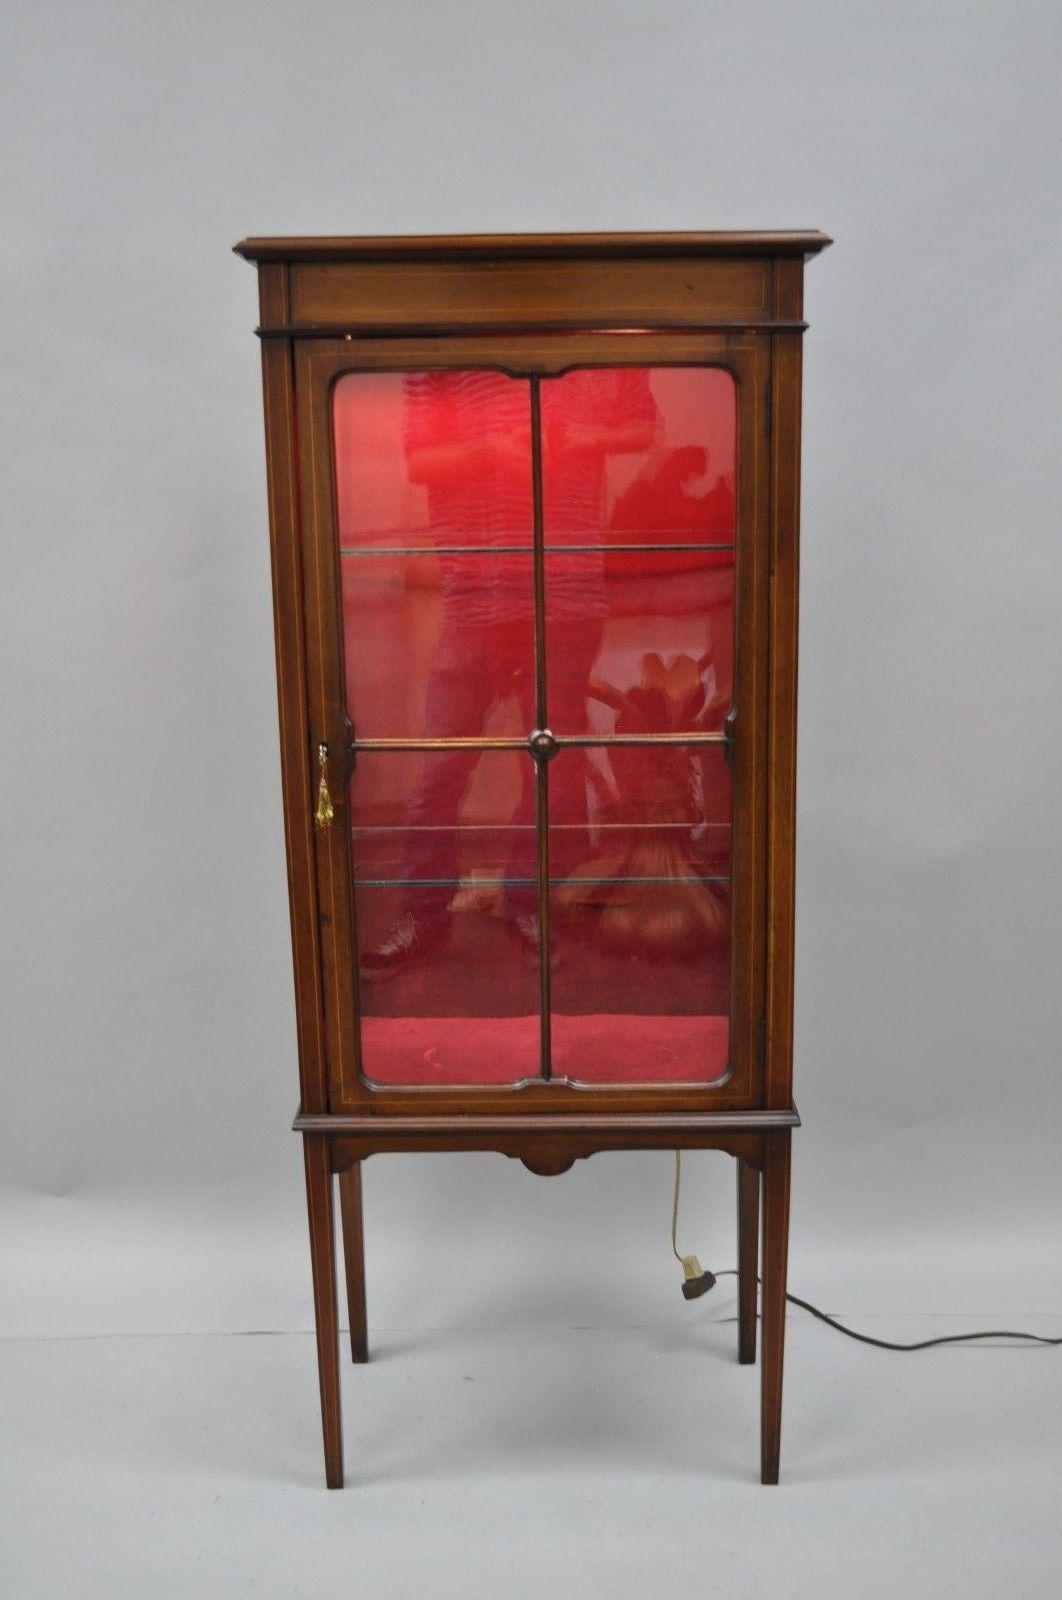 Marvelous Small Antique Edwardian Mahogany U0026 Glass Inlaid Curio Cabinet Display  Etagere   Image 2 Of 13